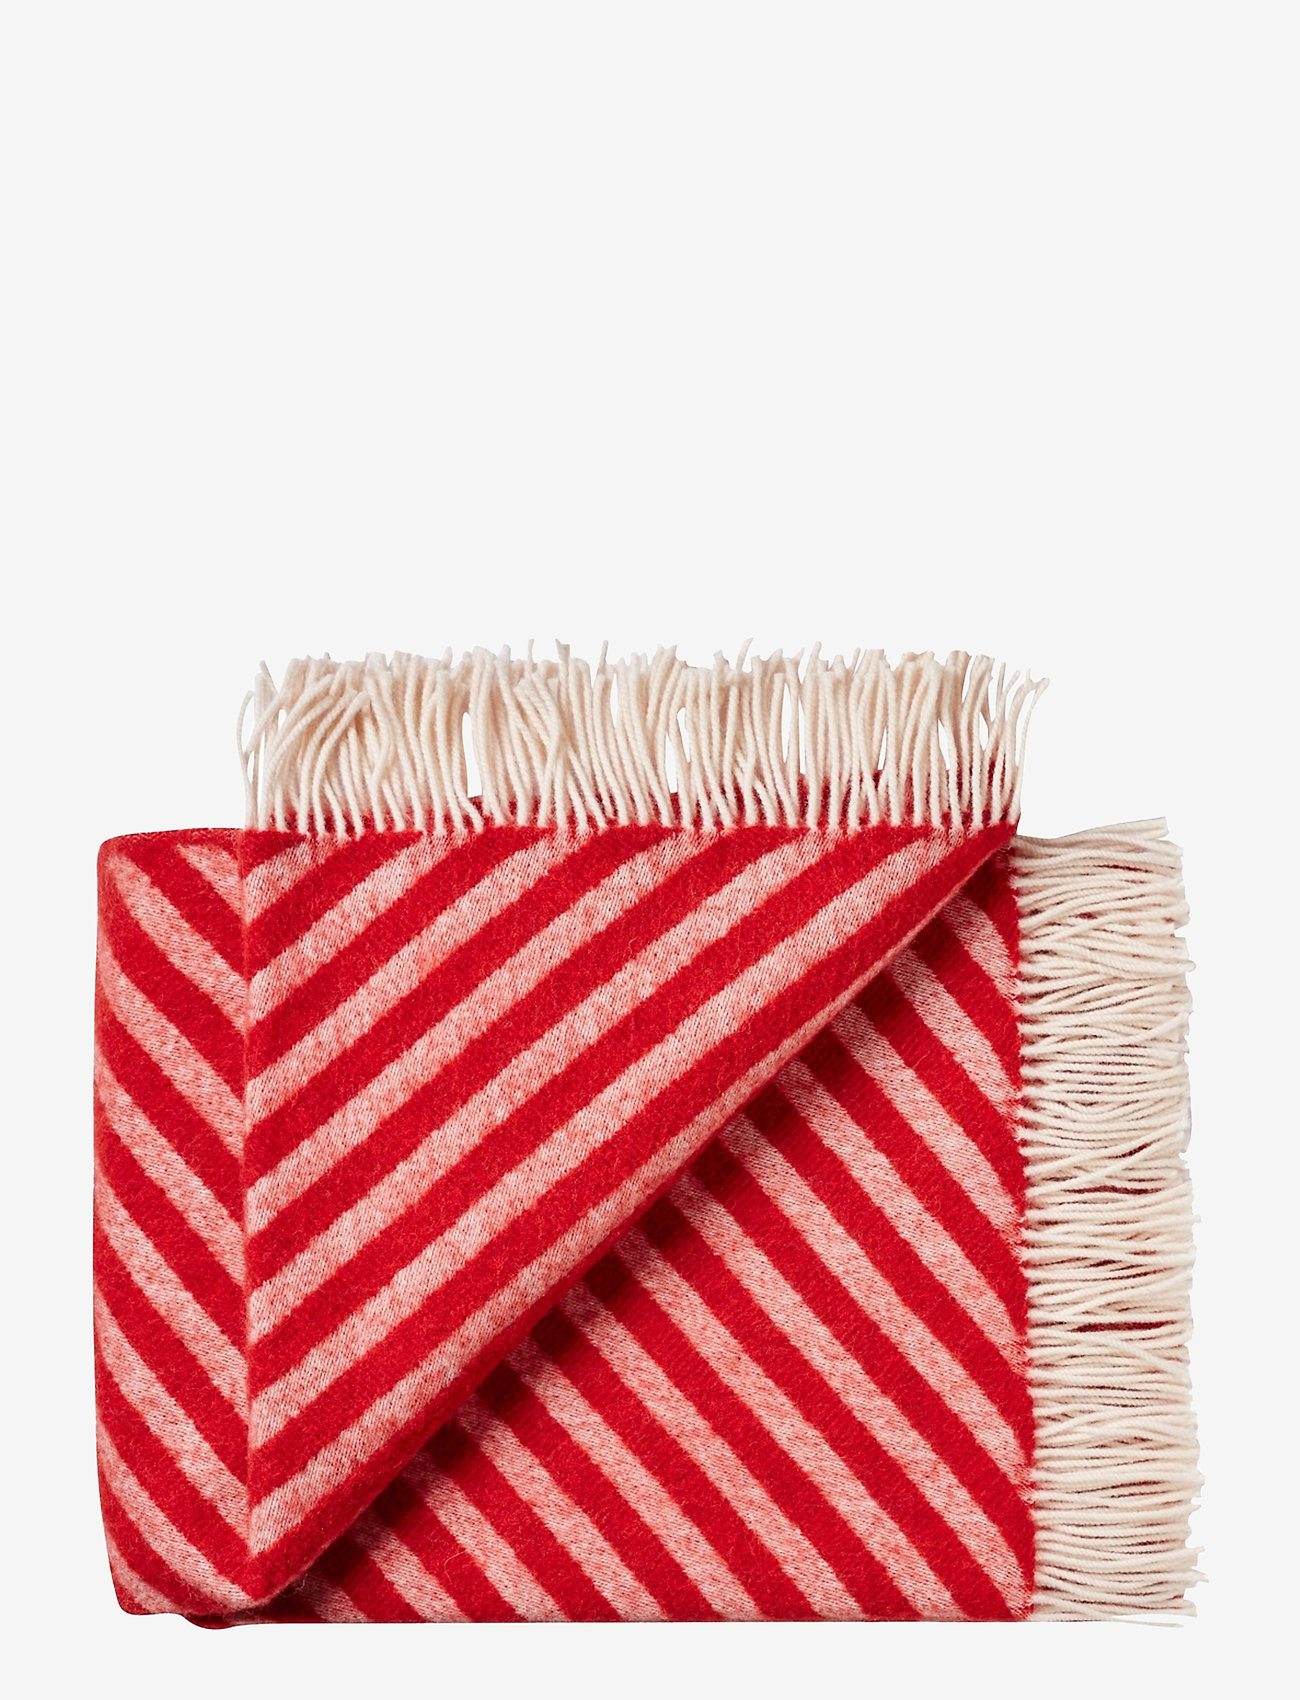 Silkeborg Uldspinderi - Campaign Straight Twill 130x190 cm - blankets - 1126 red - 0